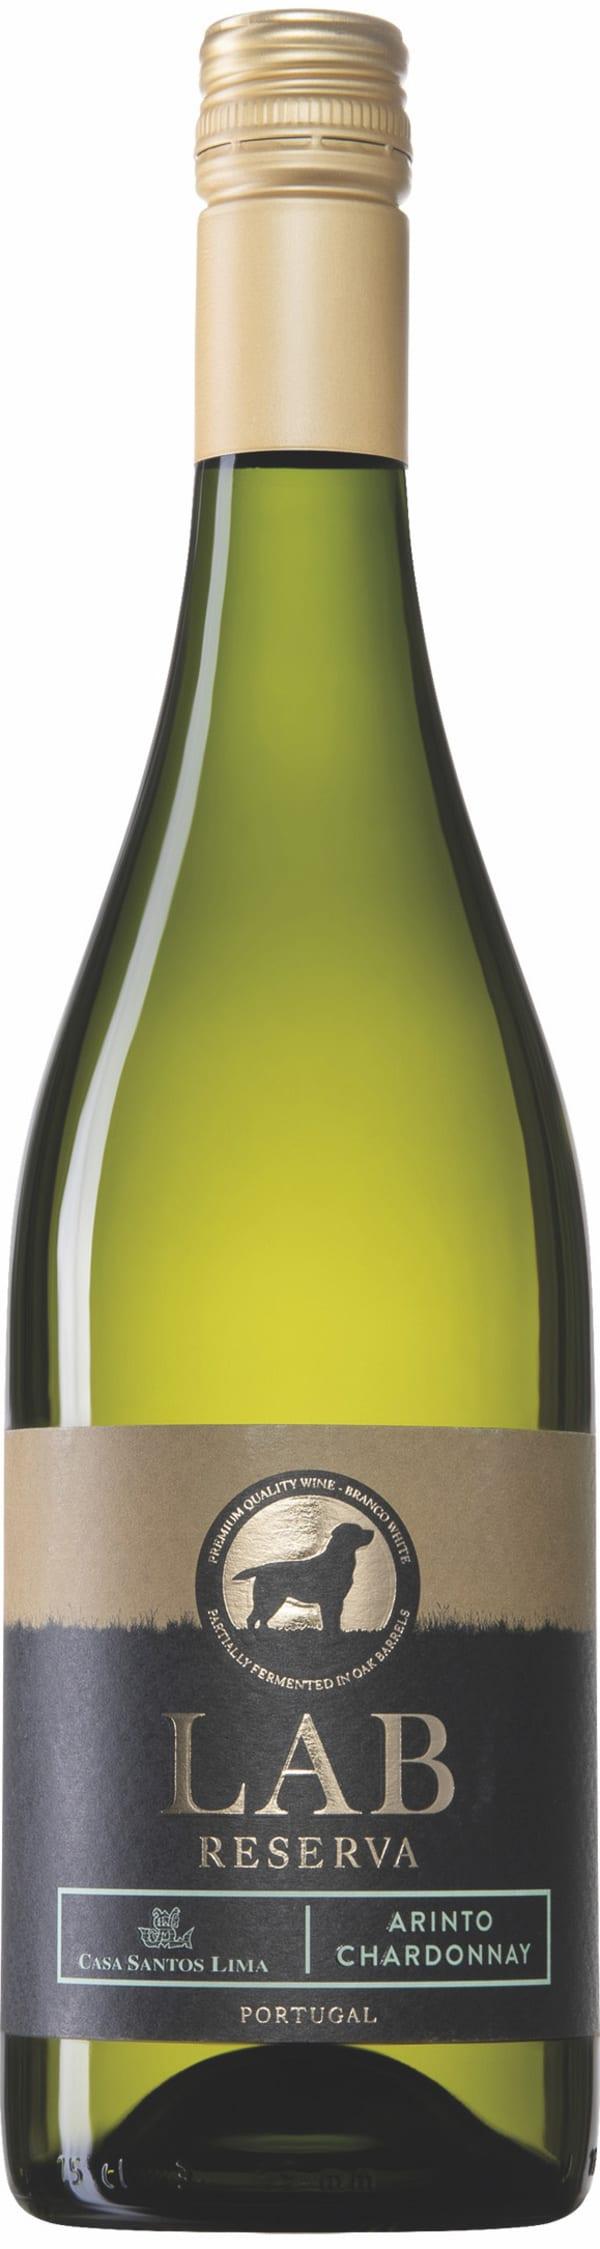 LAB Reserva Arinto Chardonnay 2014